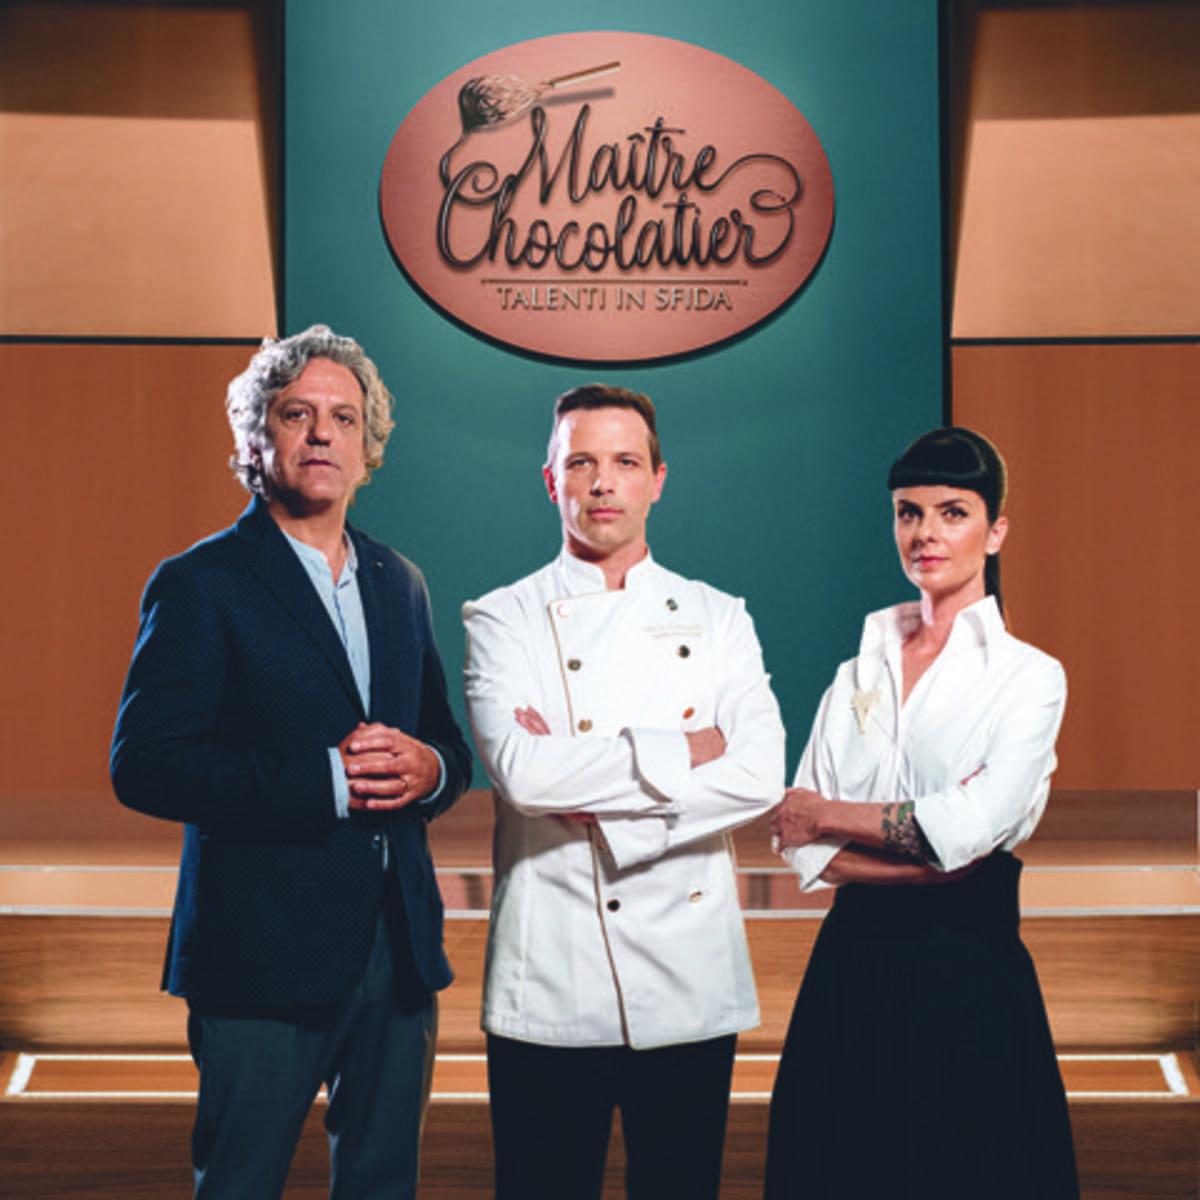 Maître Chocolatier, talenti in sfida